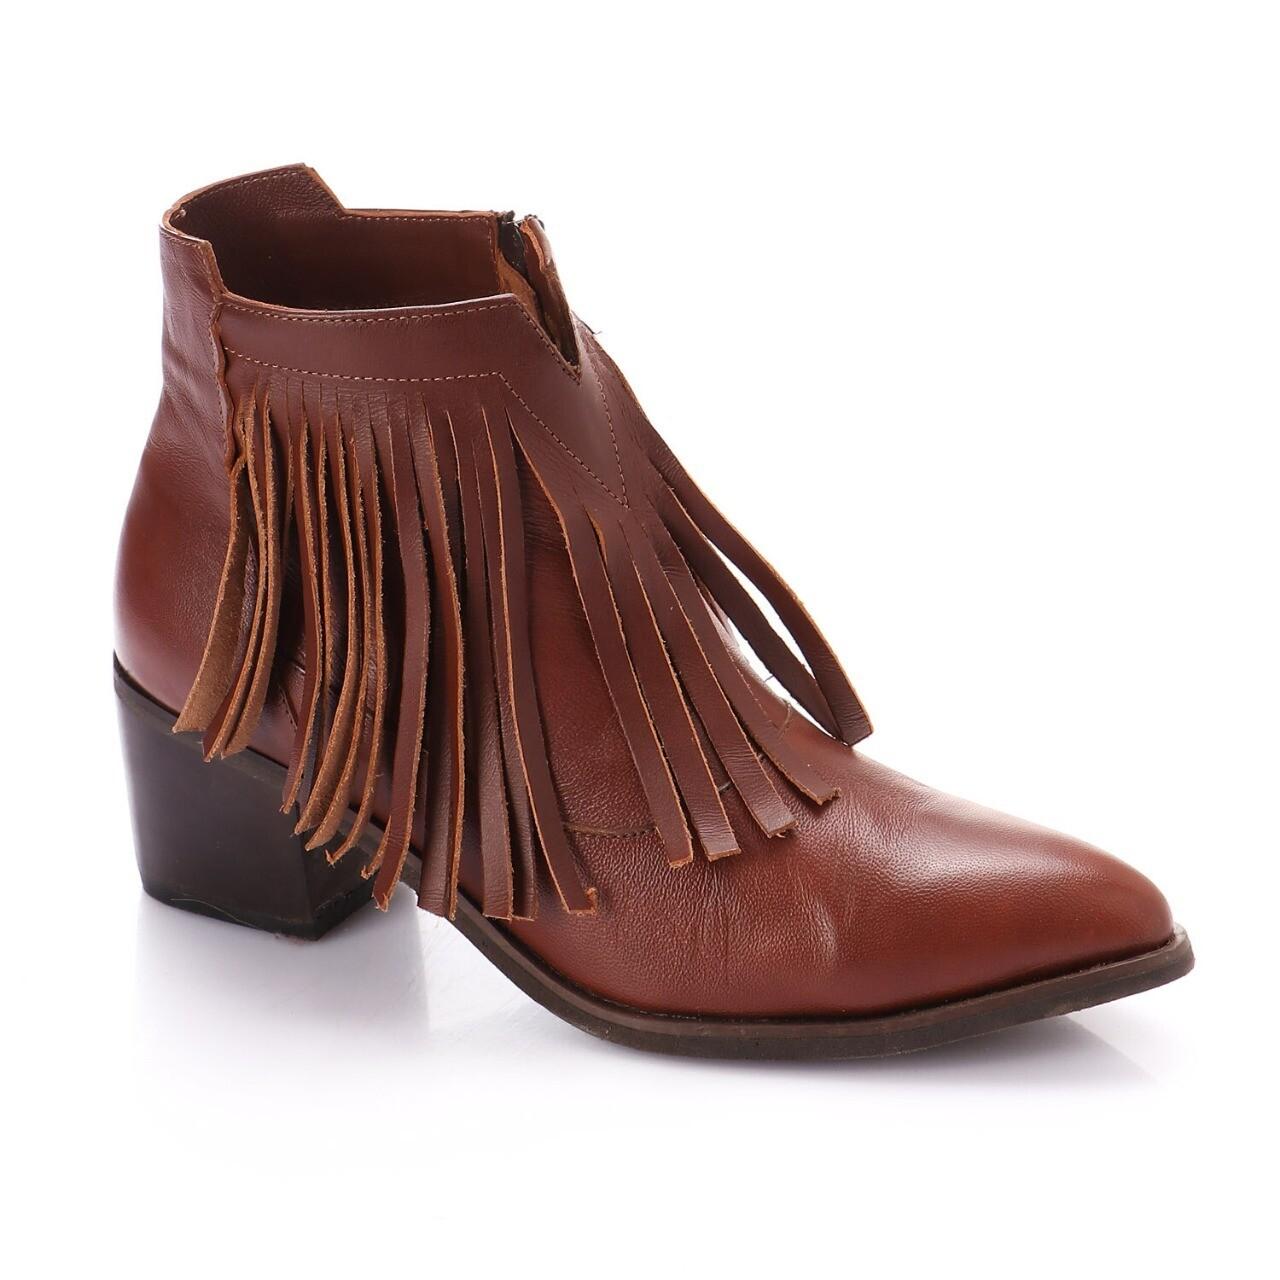 3766 Half Boot - Camel